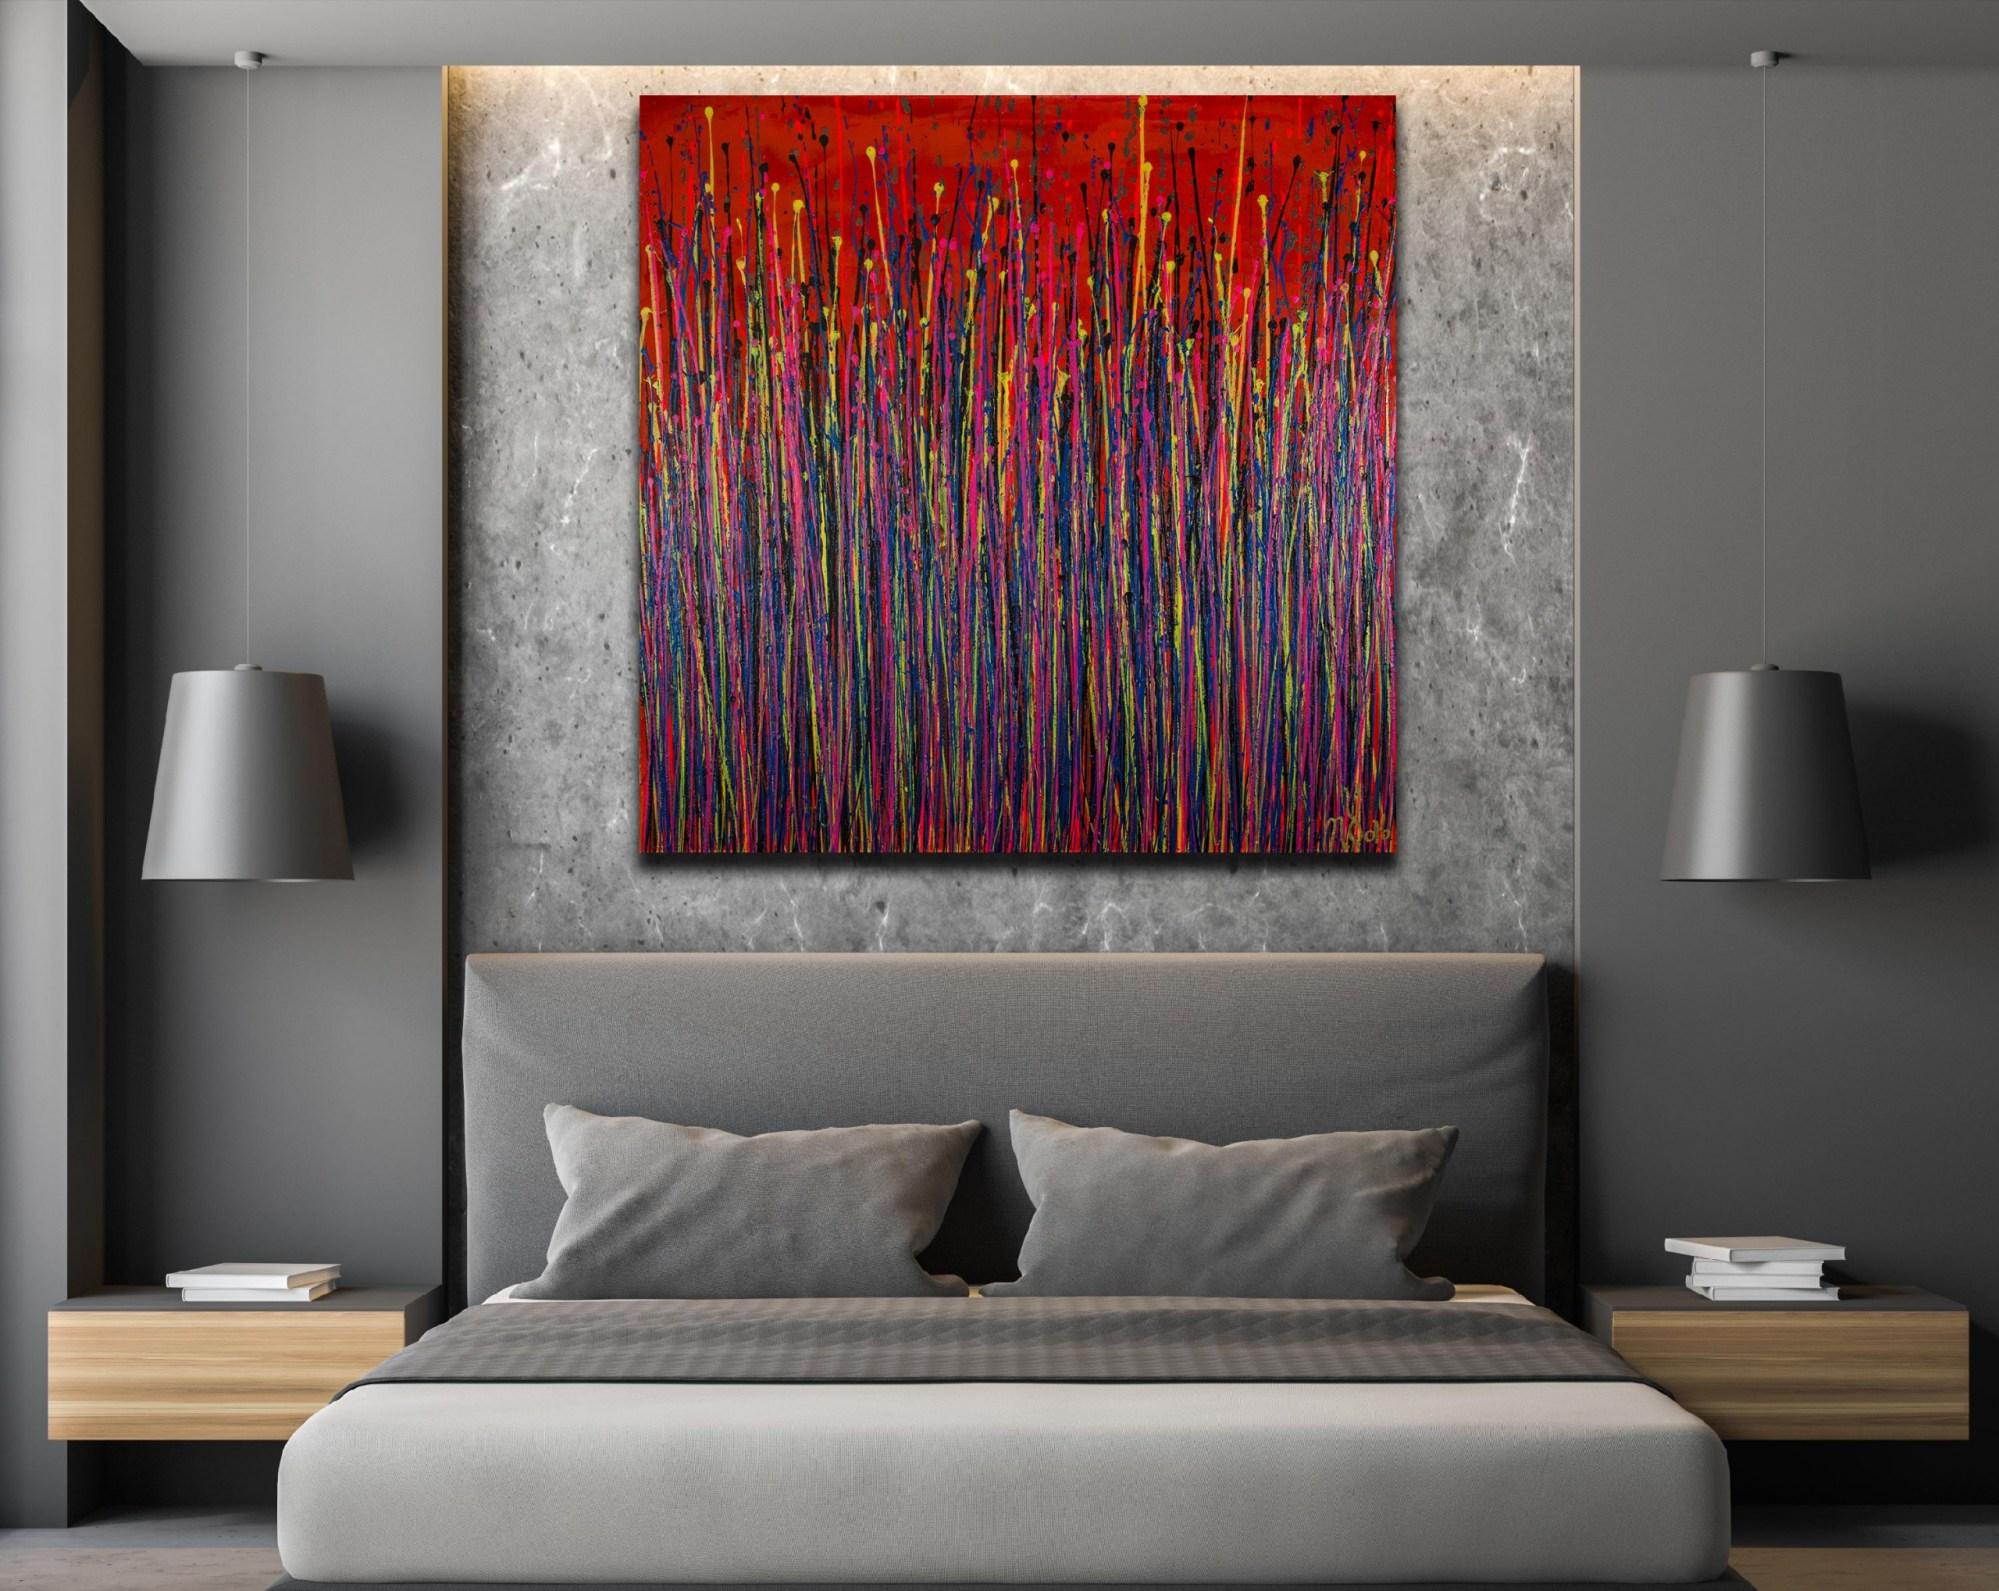 SOLD - Garden Rhythm (Over Red) 3 (2021) 36x36 inches by Nestor Toro